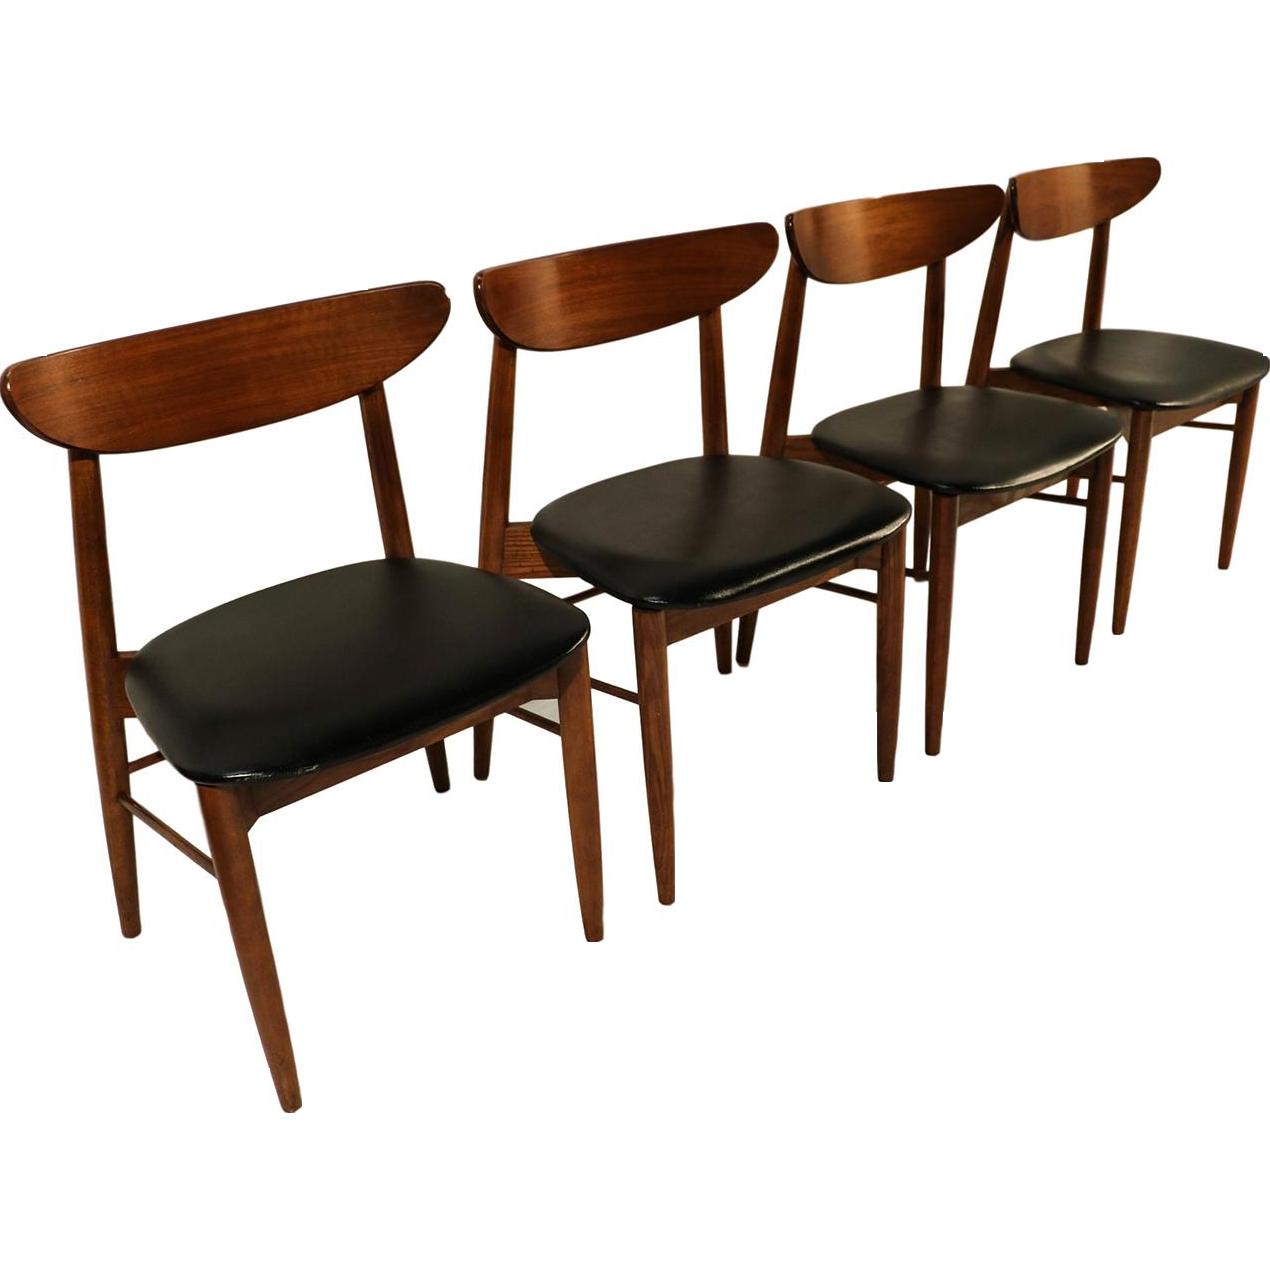 Lane Mid Century Modern Walnut Dining Chairs Vintagebeginshere At Www Rubylane Ruby Vintage Midcenturymodern